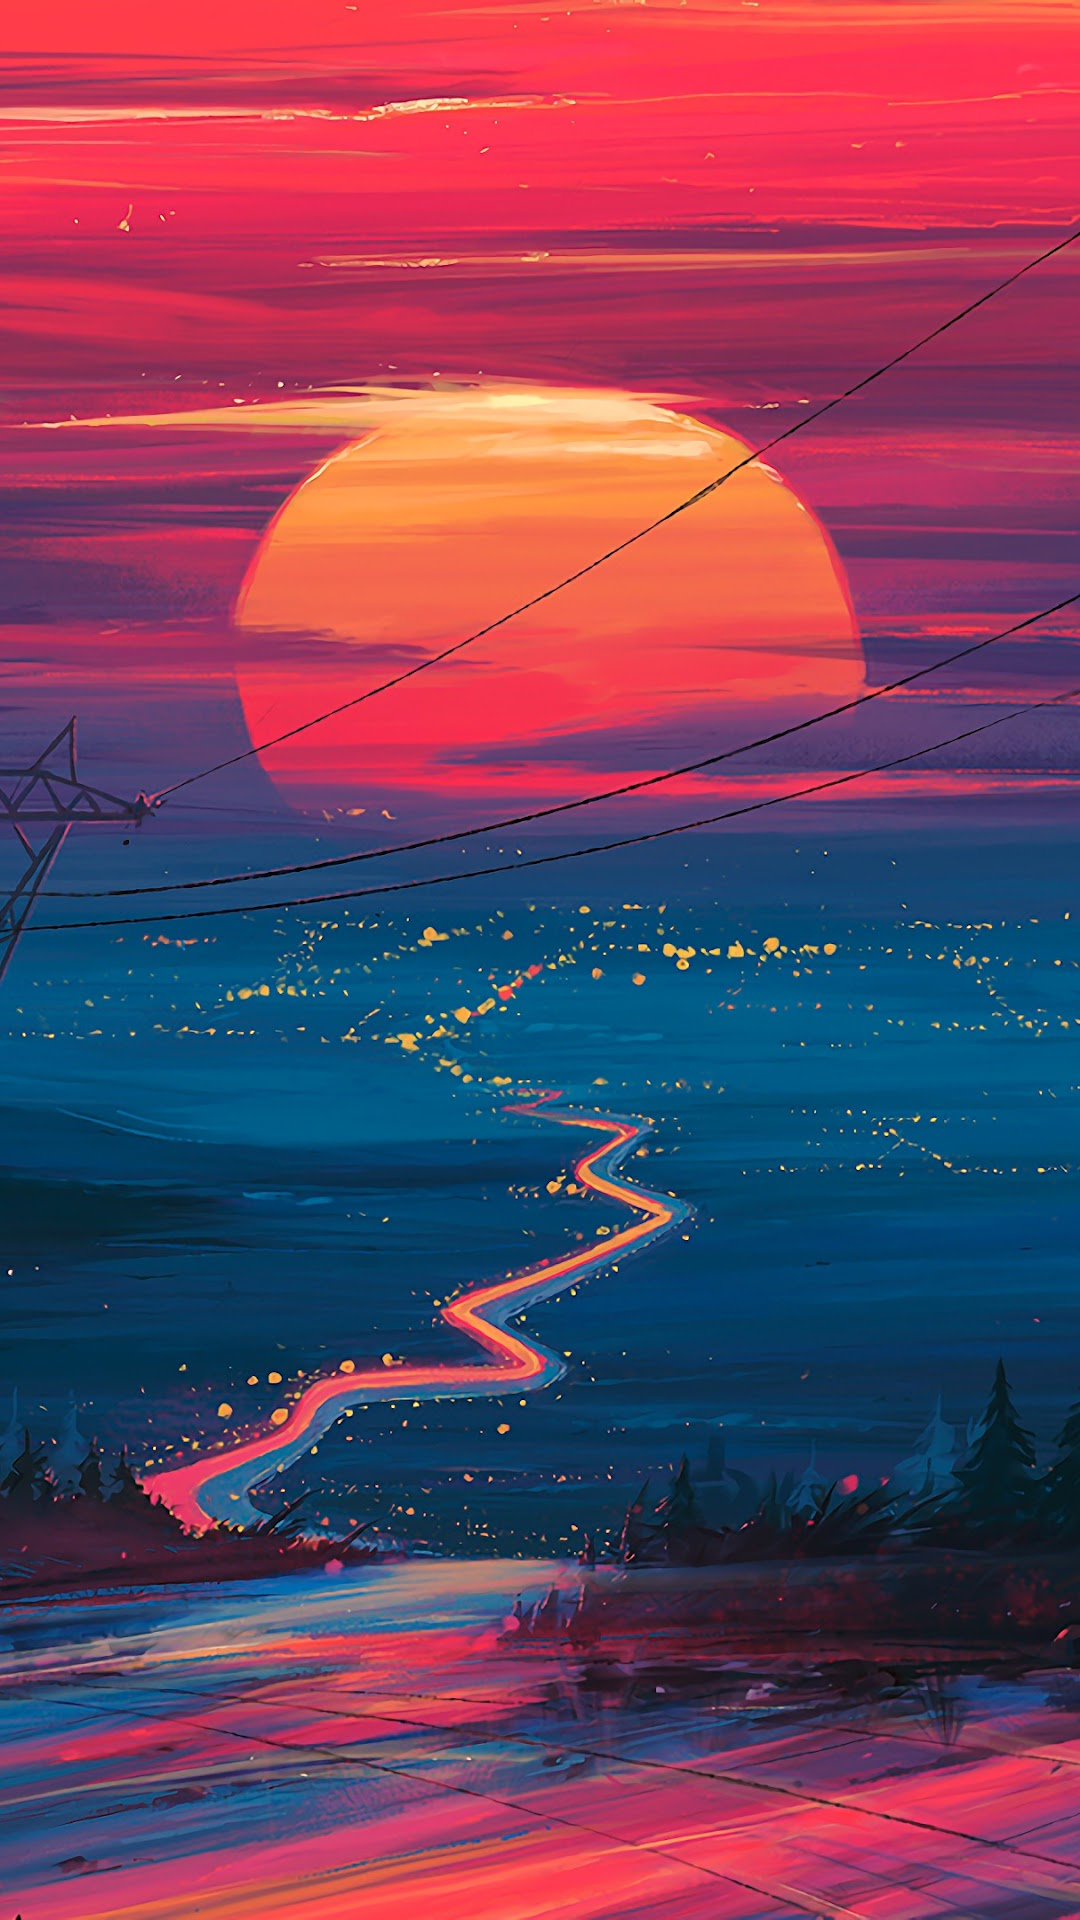 sunset horizon scenery landscape art uhdpaper.com 4K 178